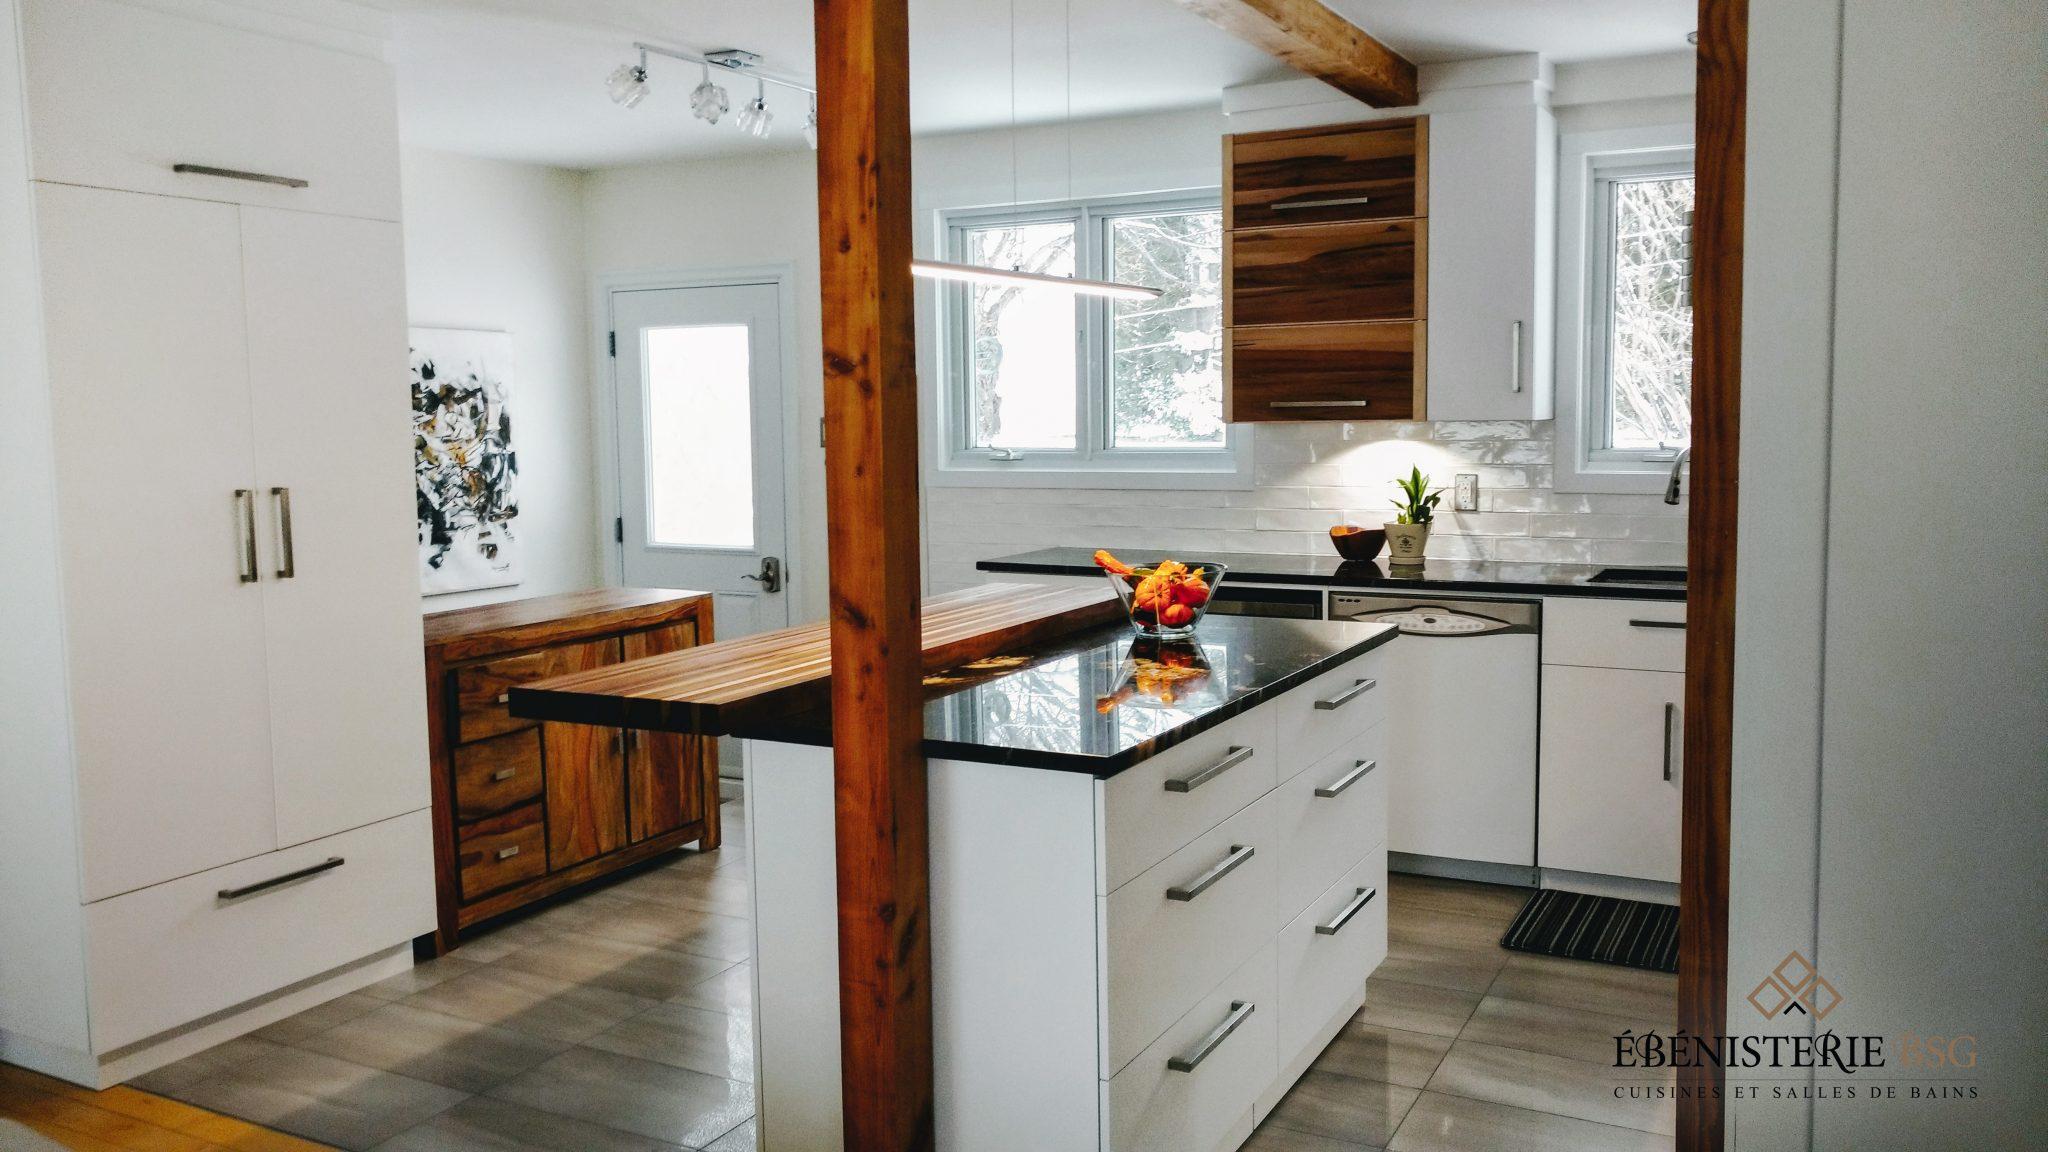 cuisine contemporaine rustique b nisterie bsg. Black Bedroom Furniture Sets. Home Design Ideas